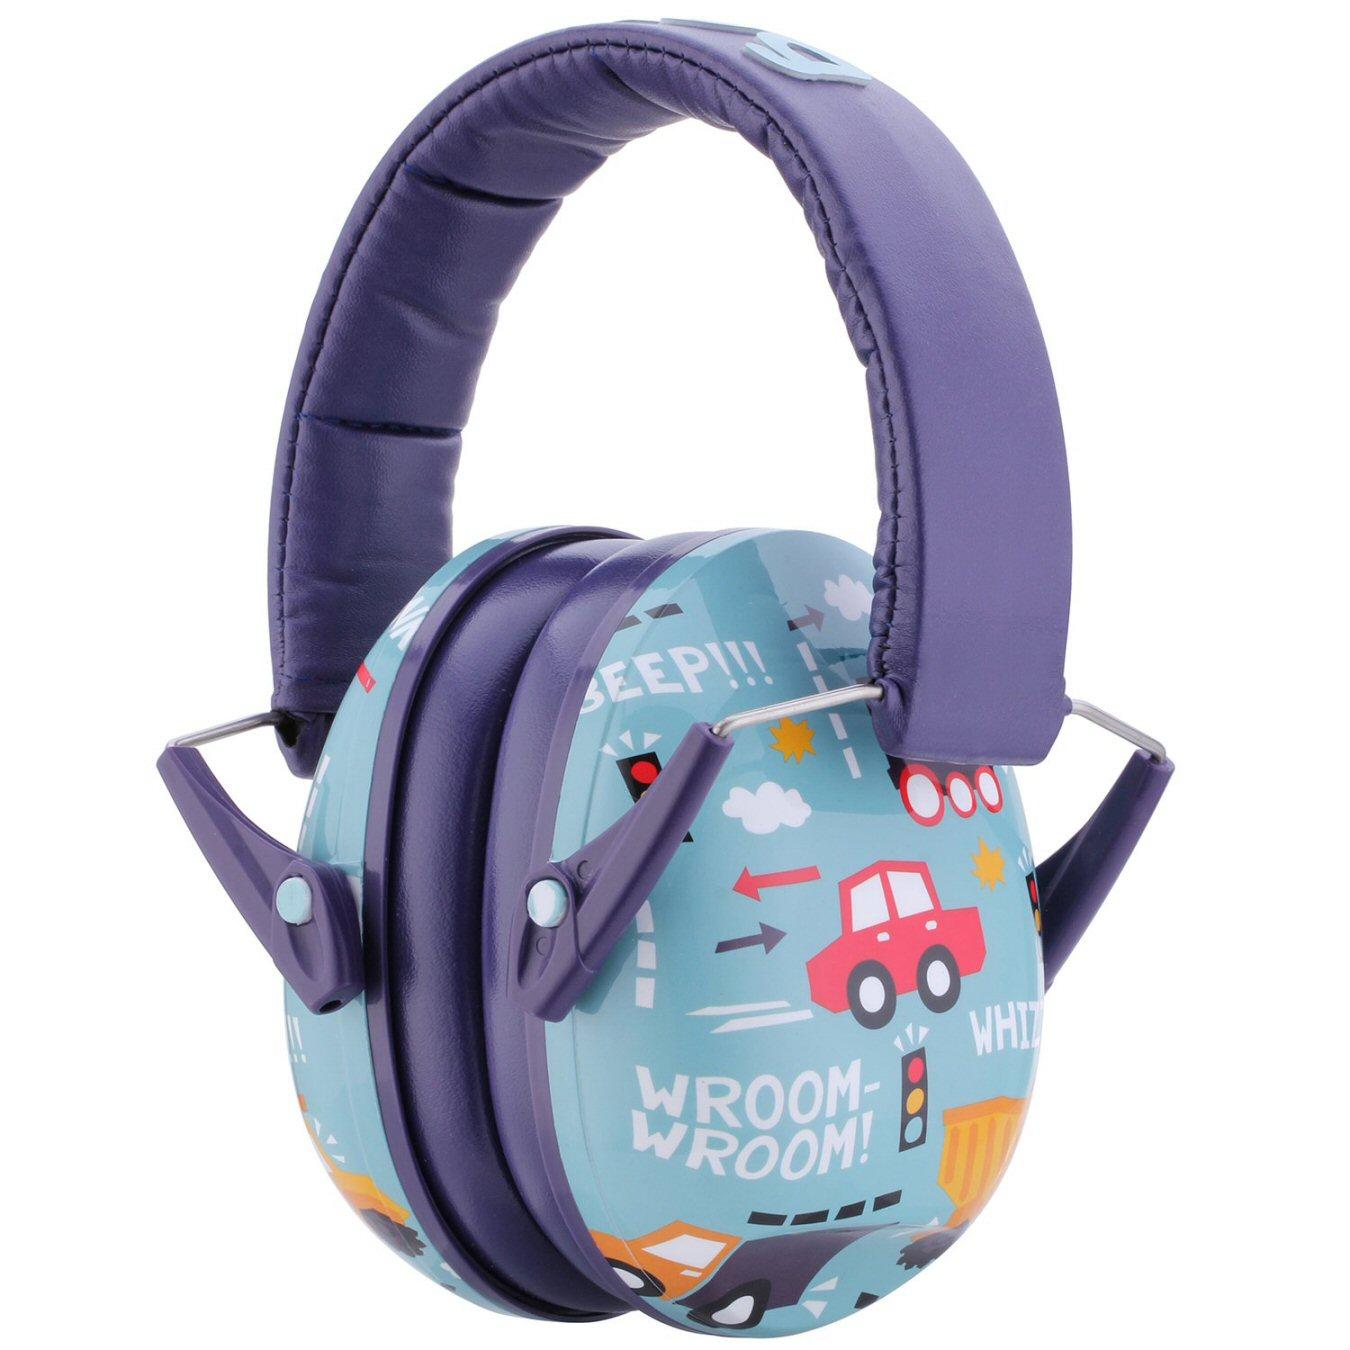 snug kids earmuffs